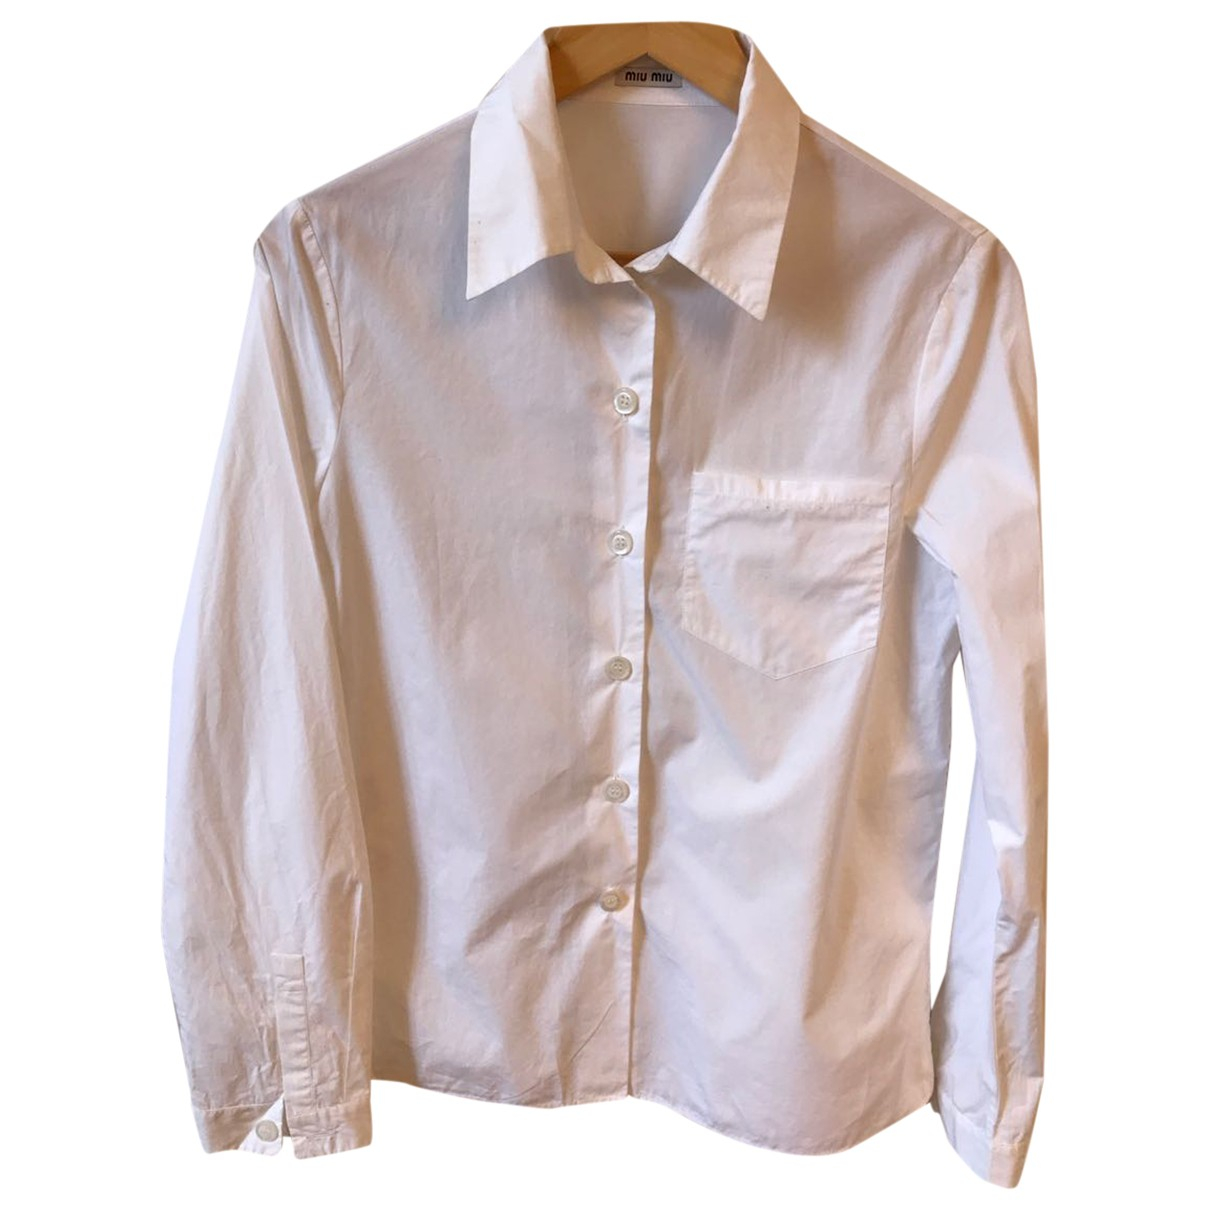 Miu Miu - Top   pour femme en coton - blanc